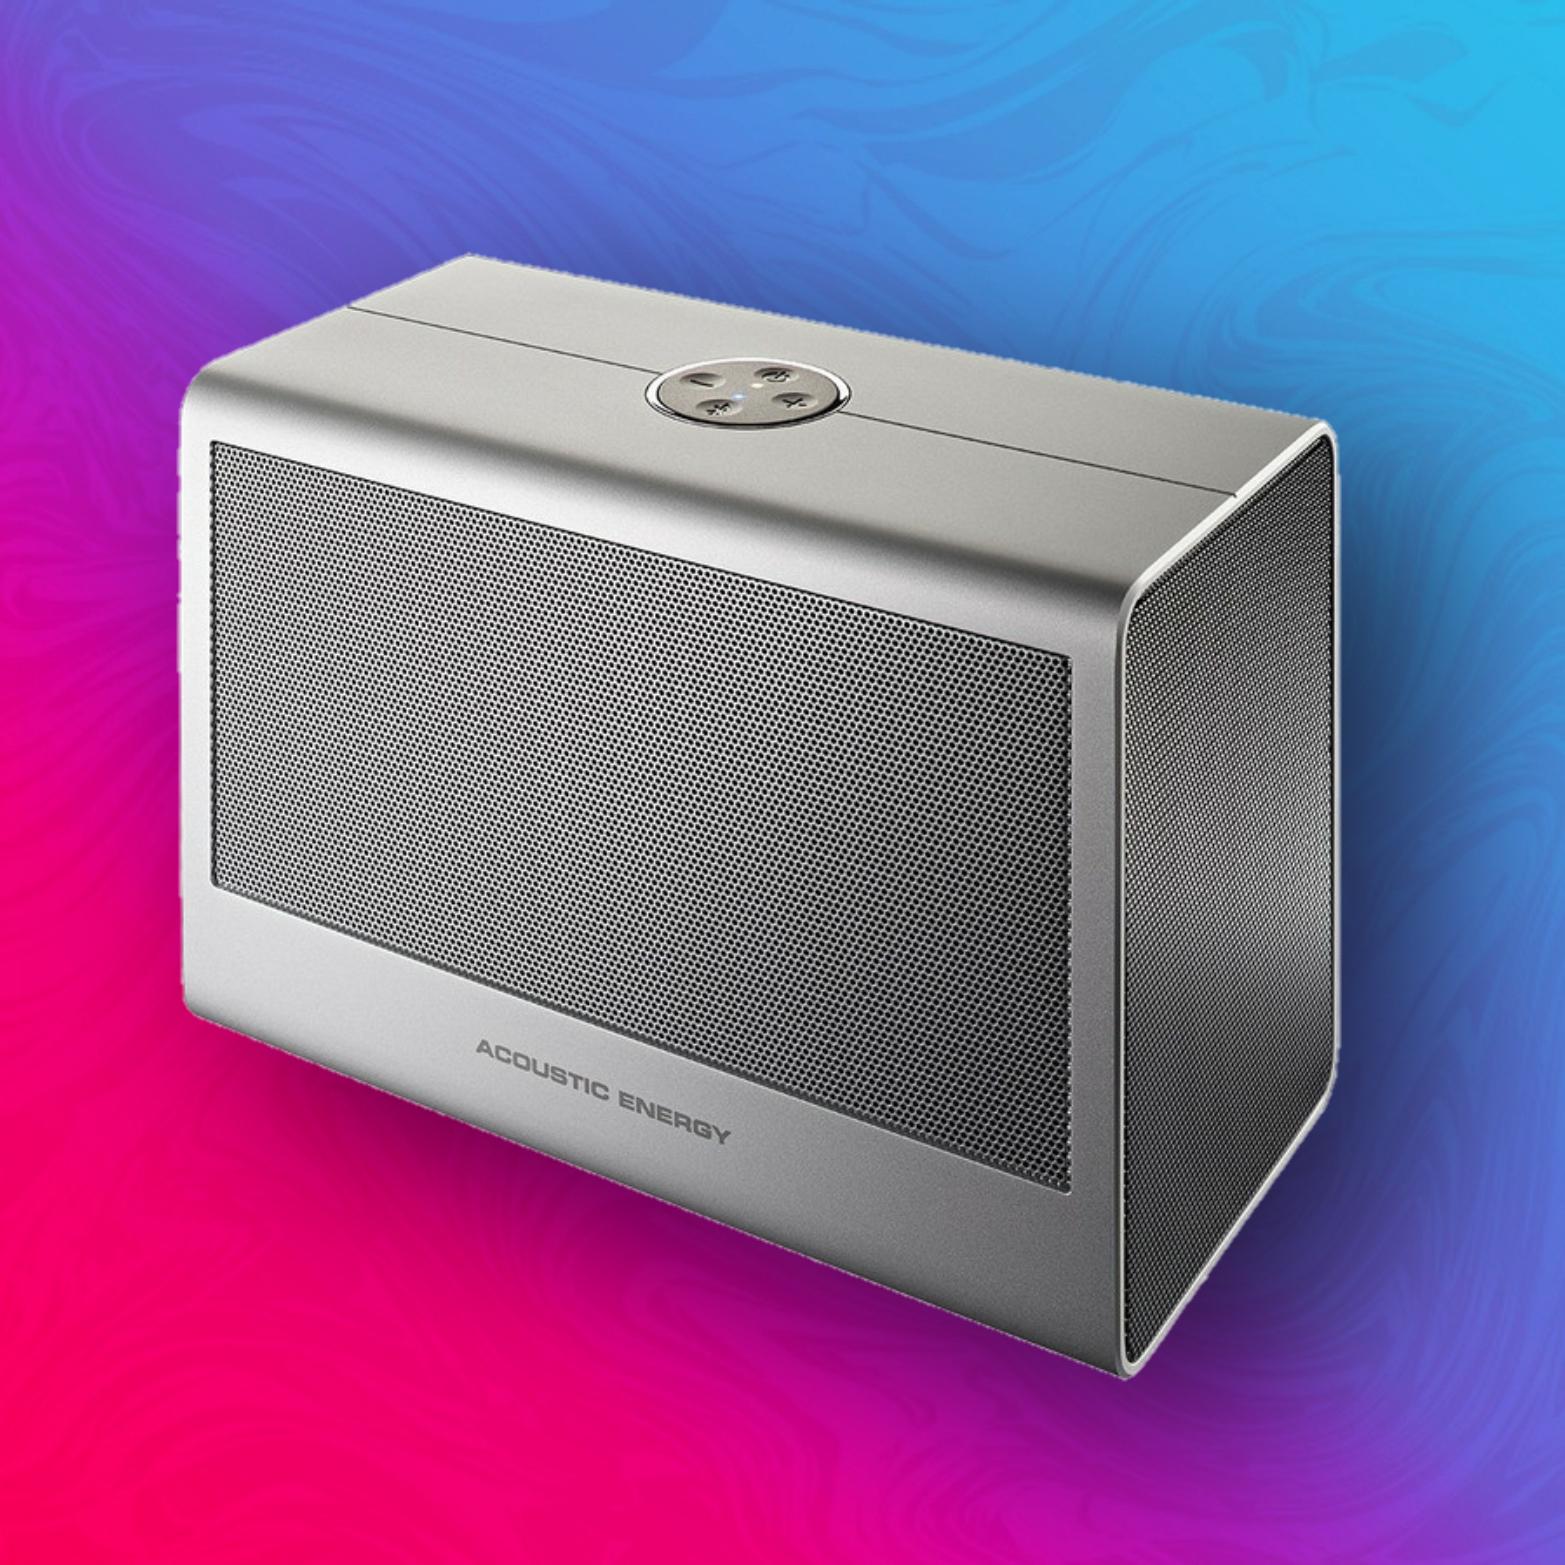 Acoustic Energy Aego BT2 Tragbarer Lautsprecher